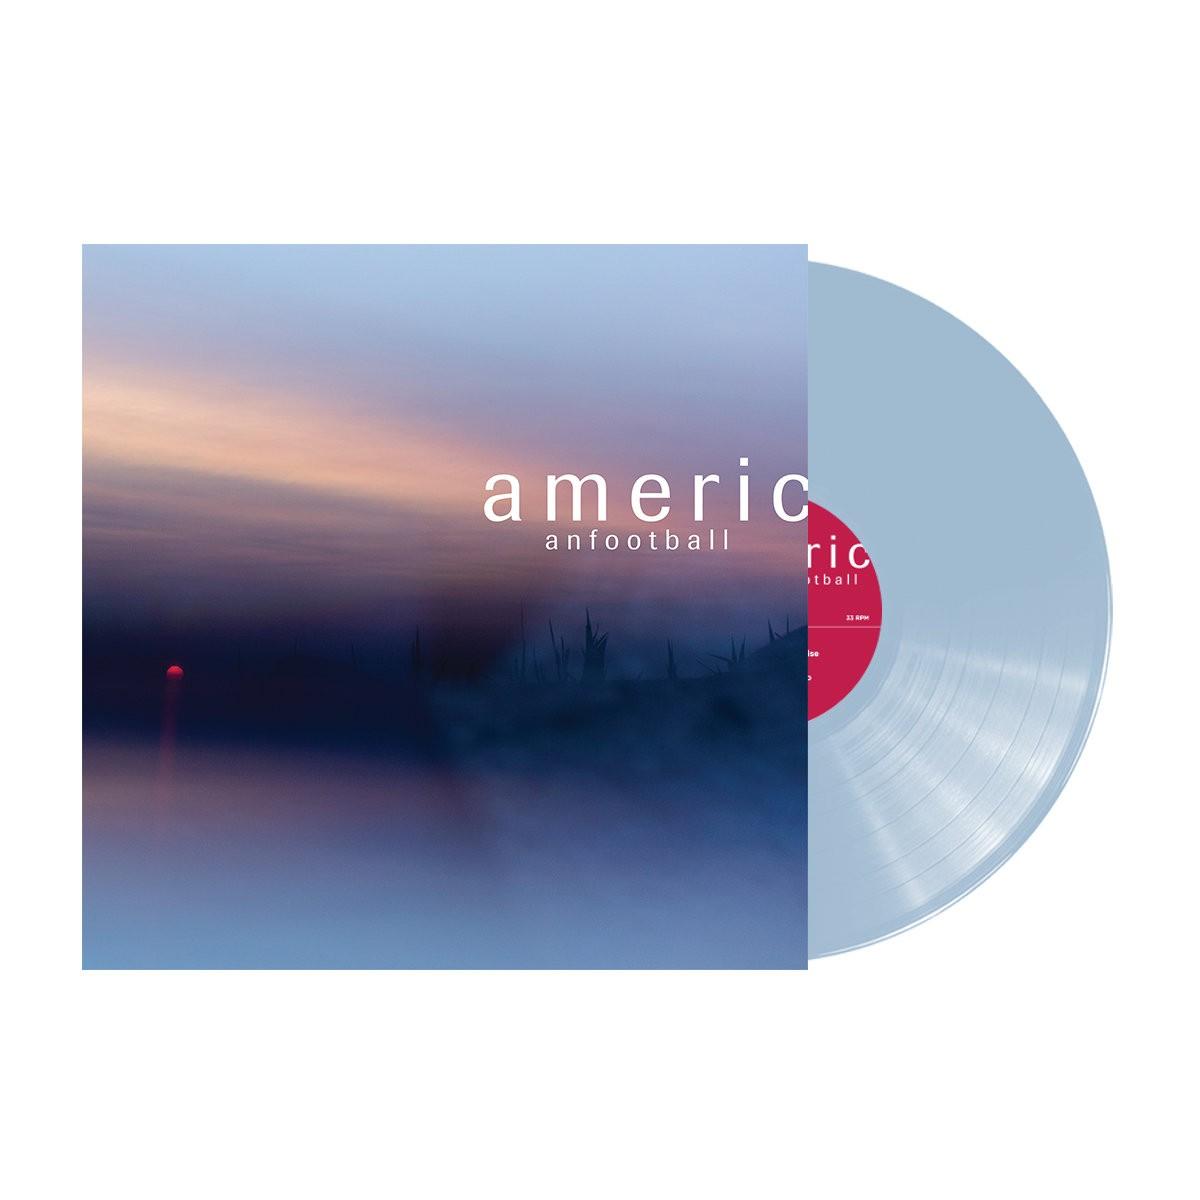 American Football - American Football LP3 (Light Blue) 2XLP